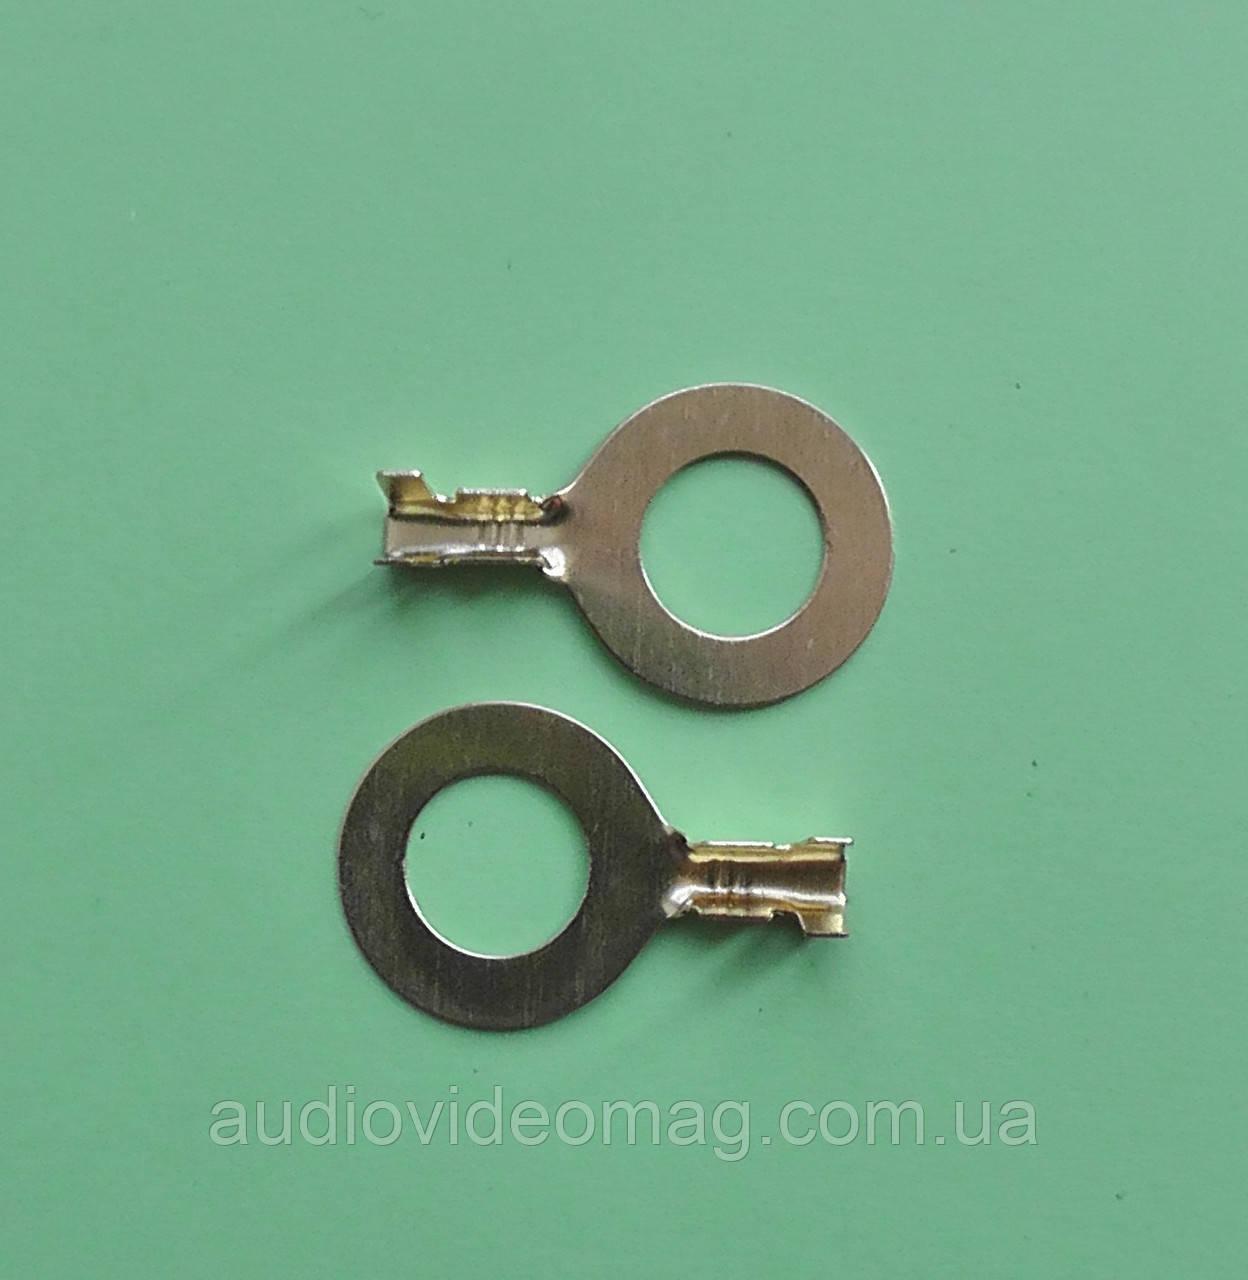 Клемма кольцевая под контакт 10 мм, упаковка 50 шт.